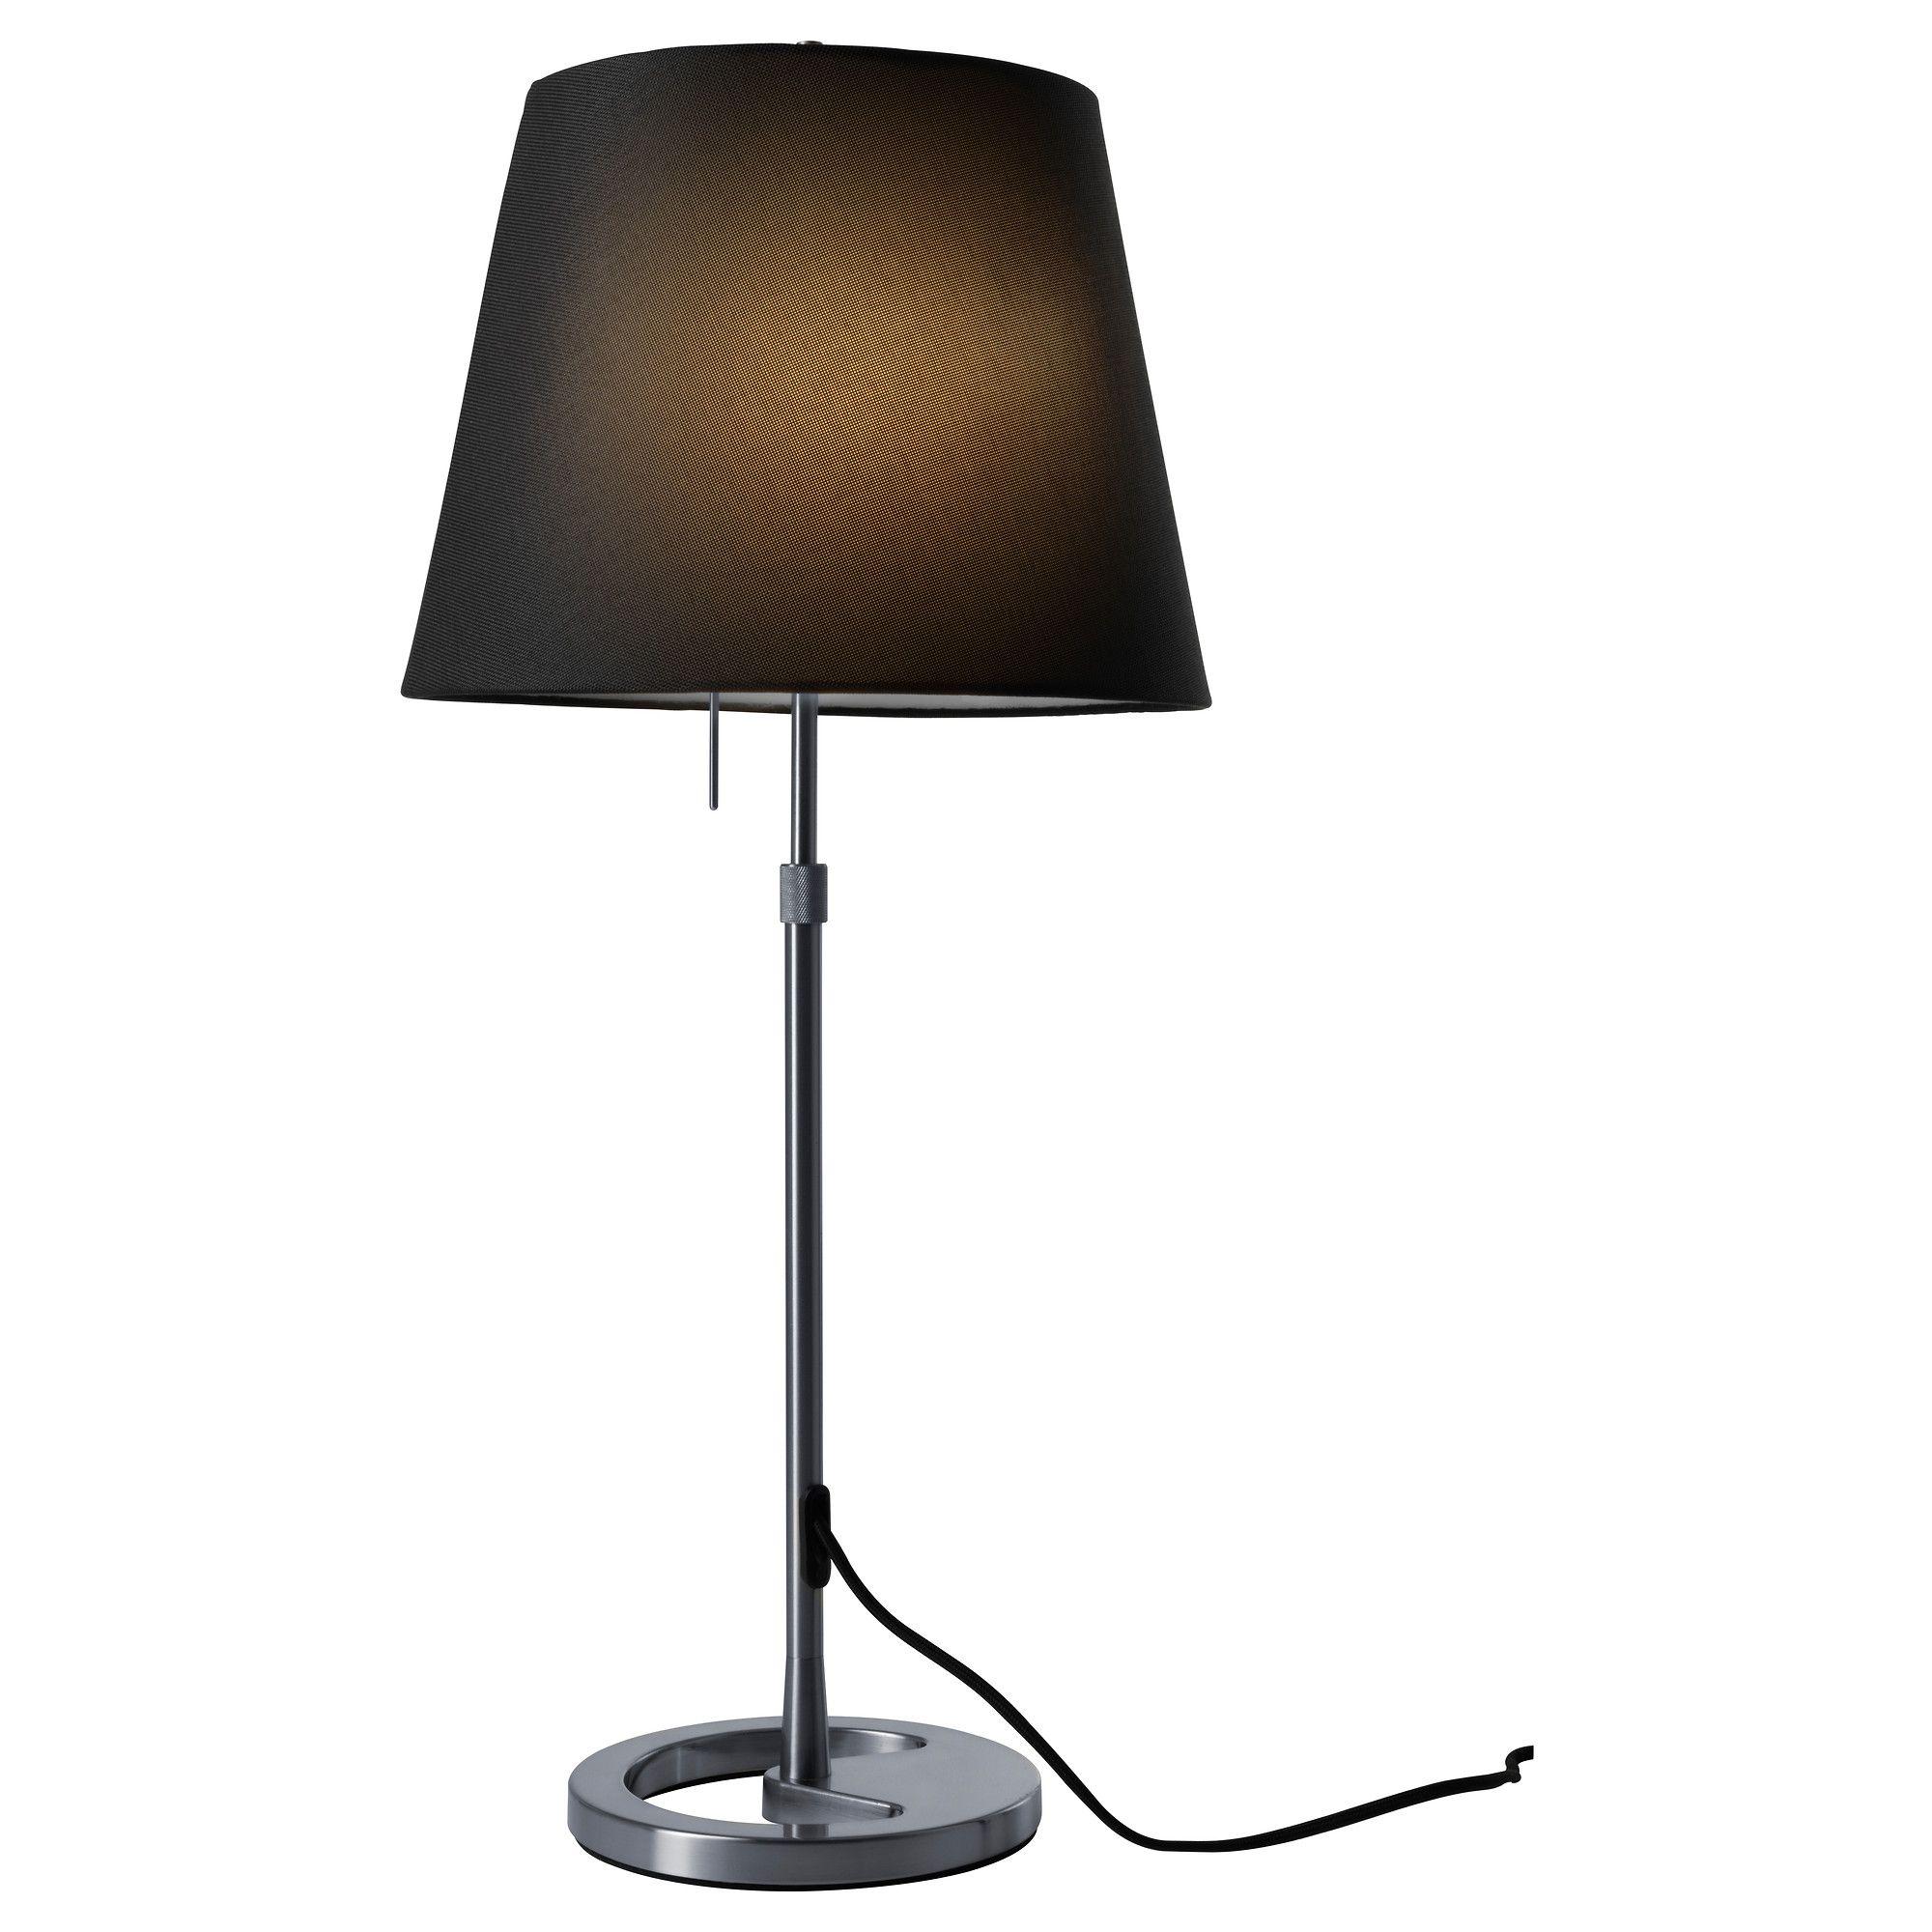 Ikea Us Furniture And Home Furnishings Modern Table Lamp Lamp Ikea